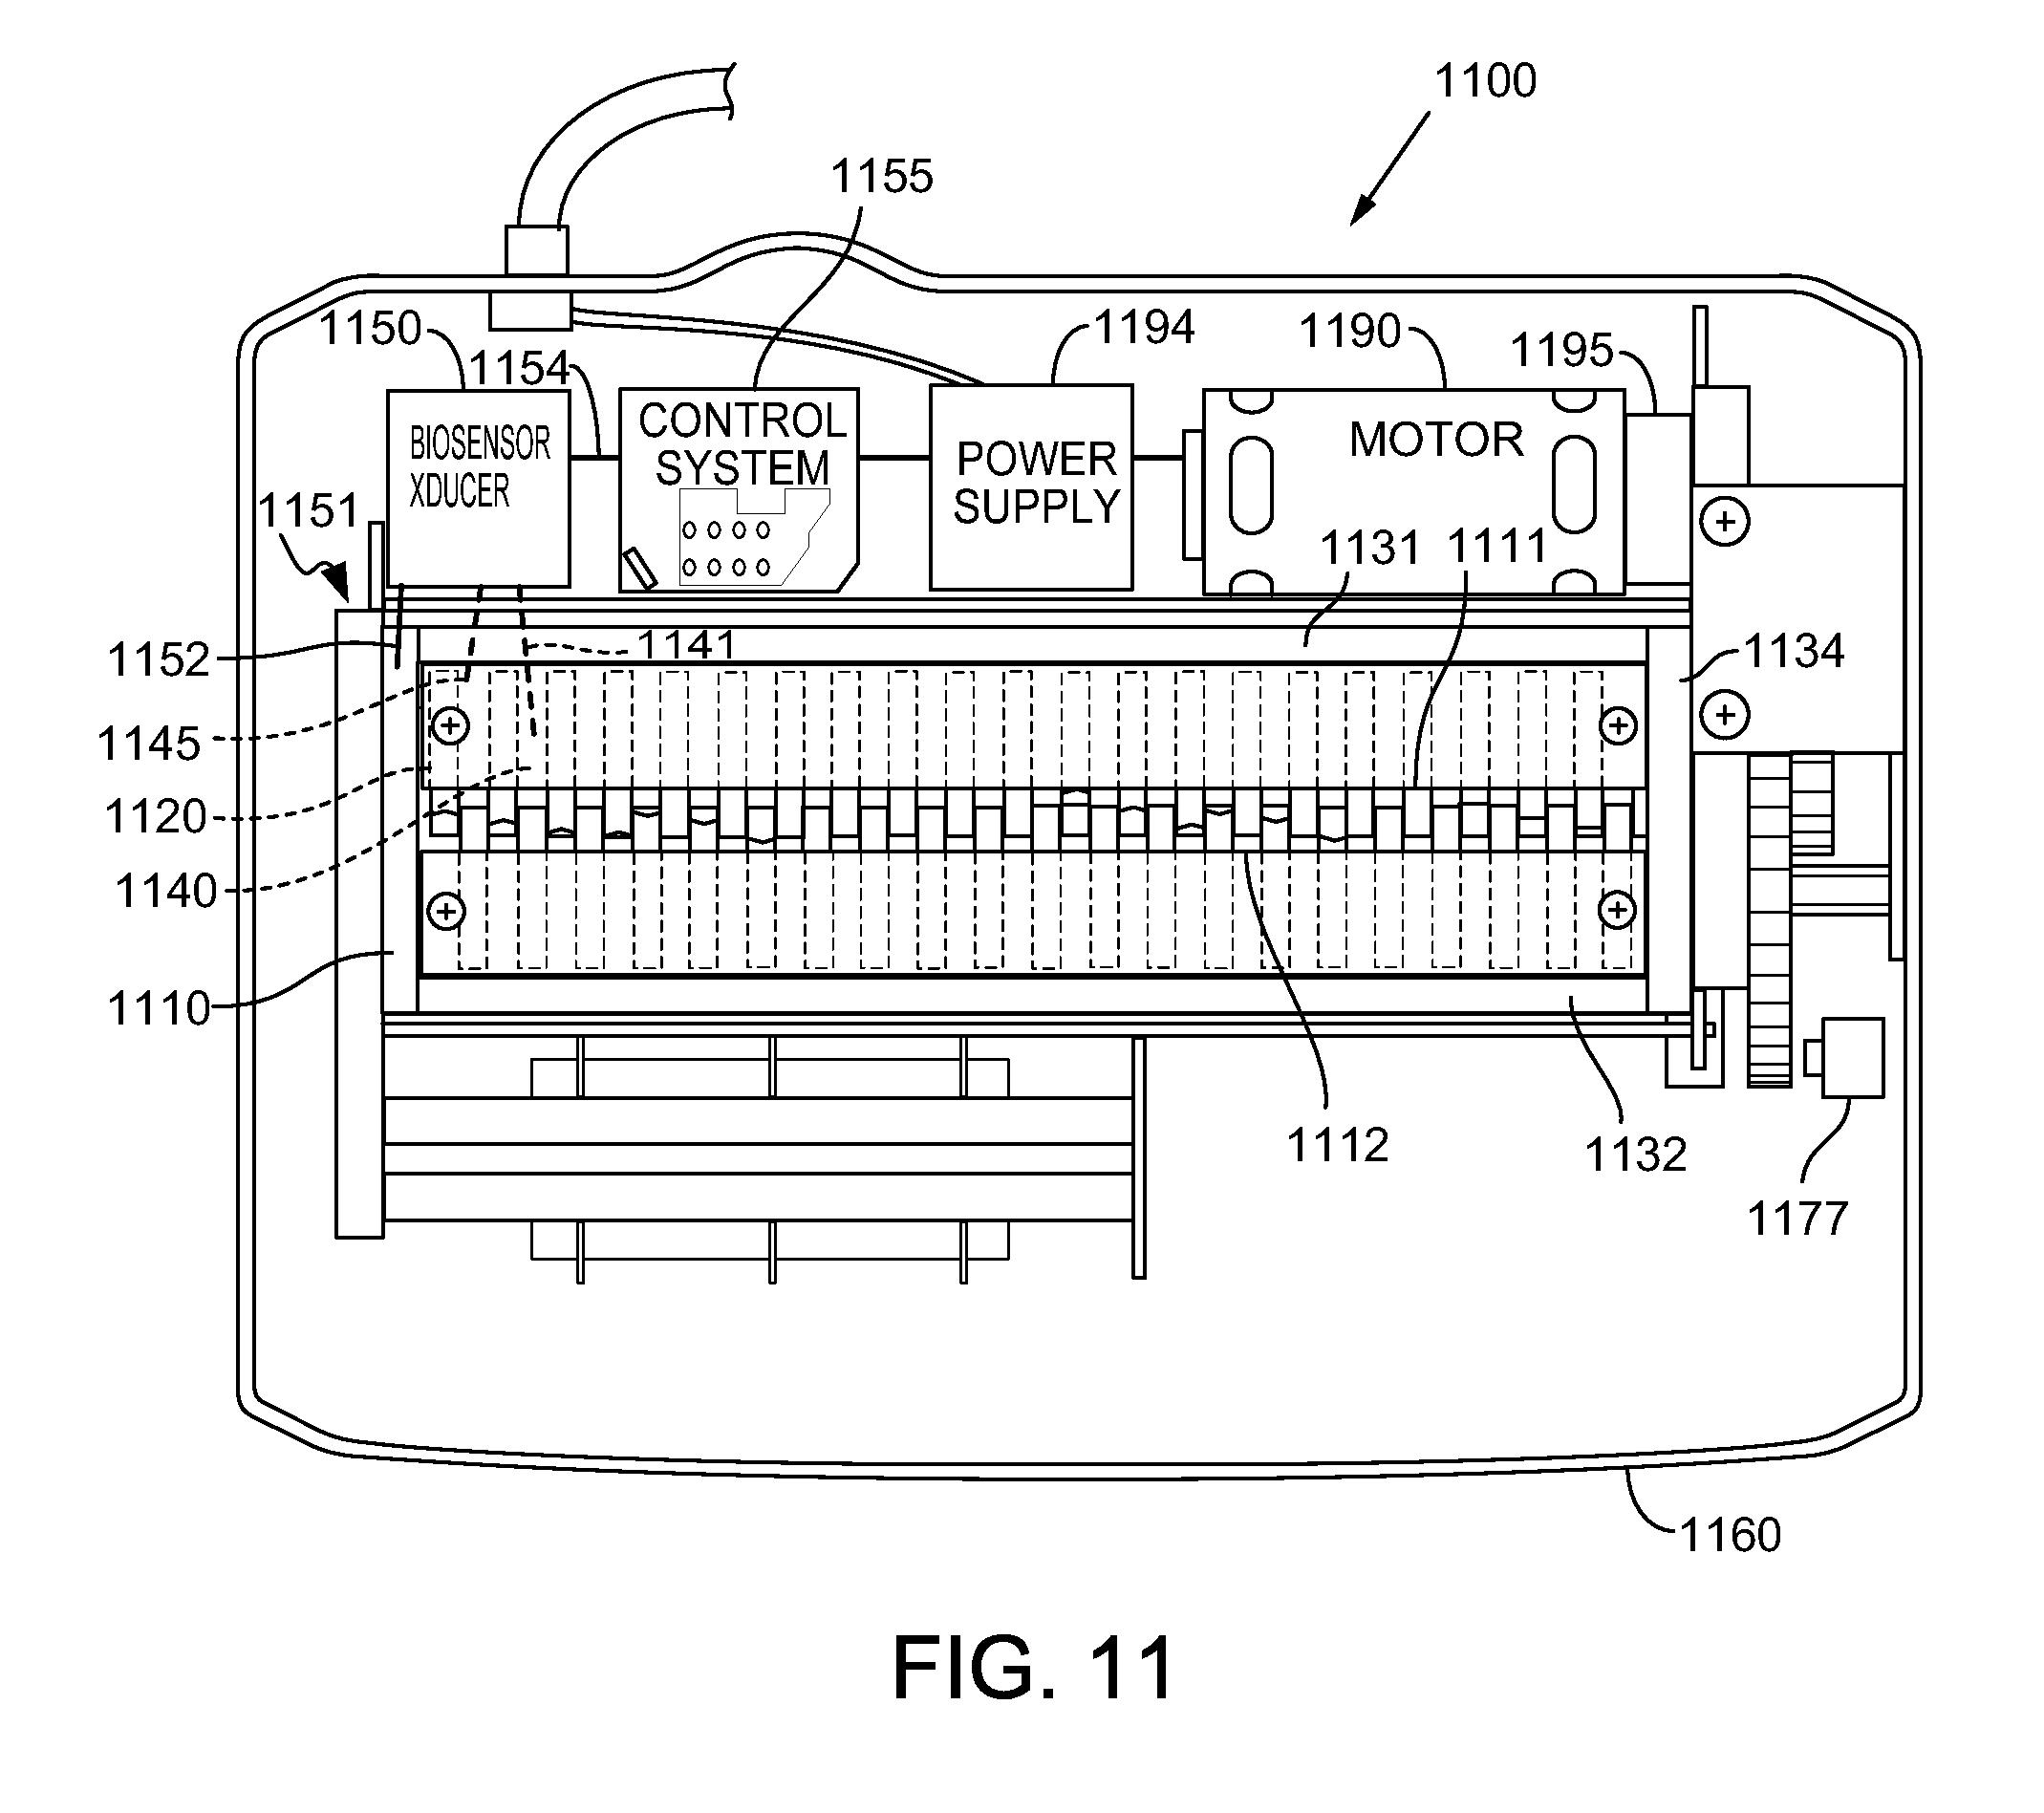 motor capacitor wiring diagram manual 2003 chevy silverado radio harness paper shredder 35